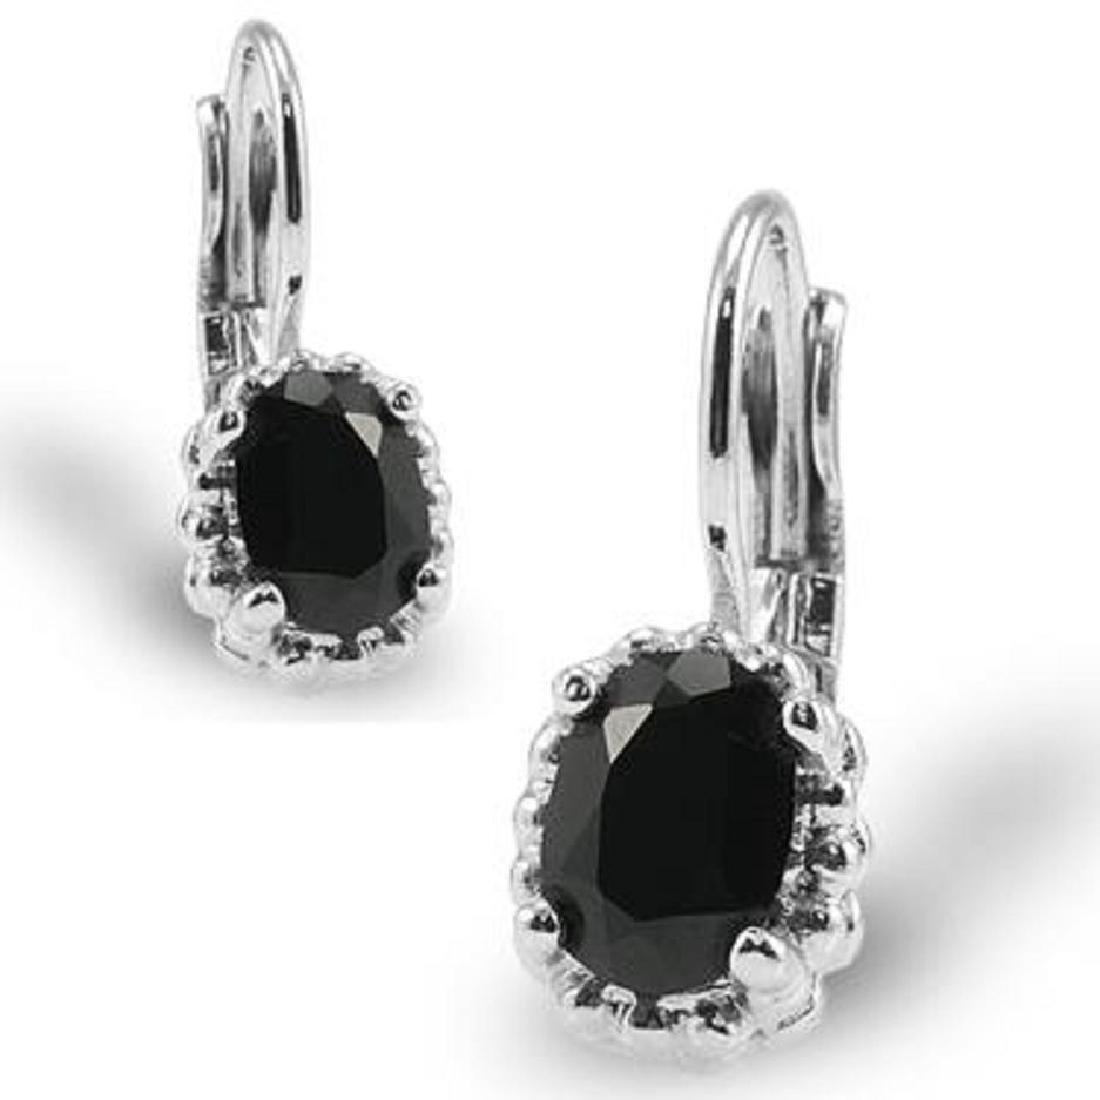 Genuine Black Onyx Leverback Earrings